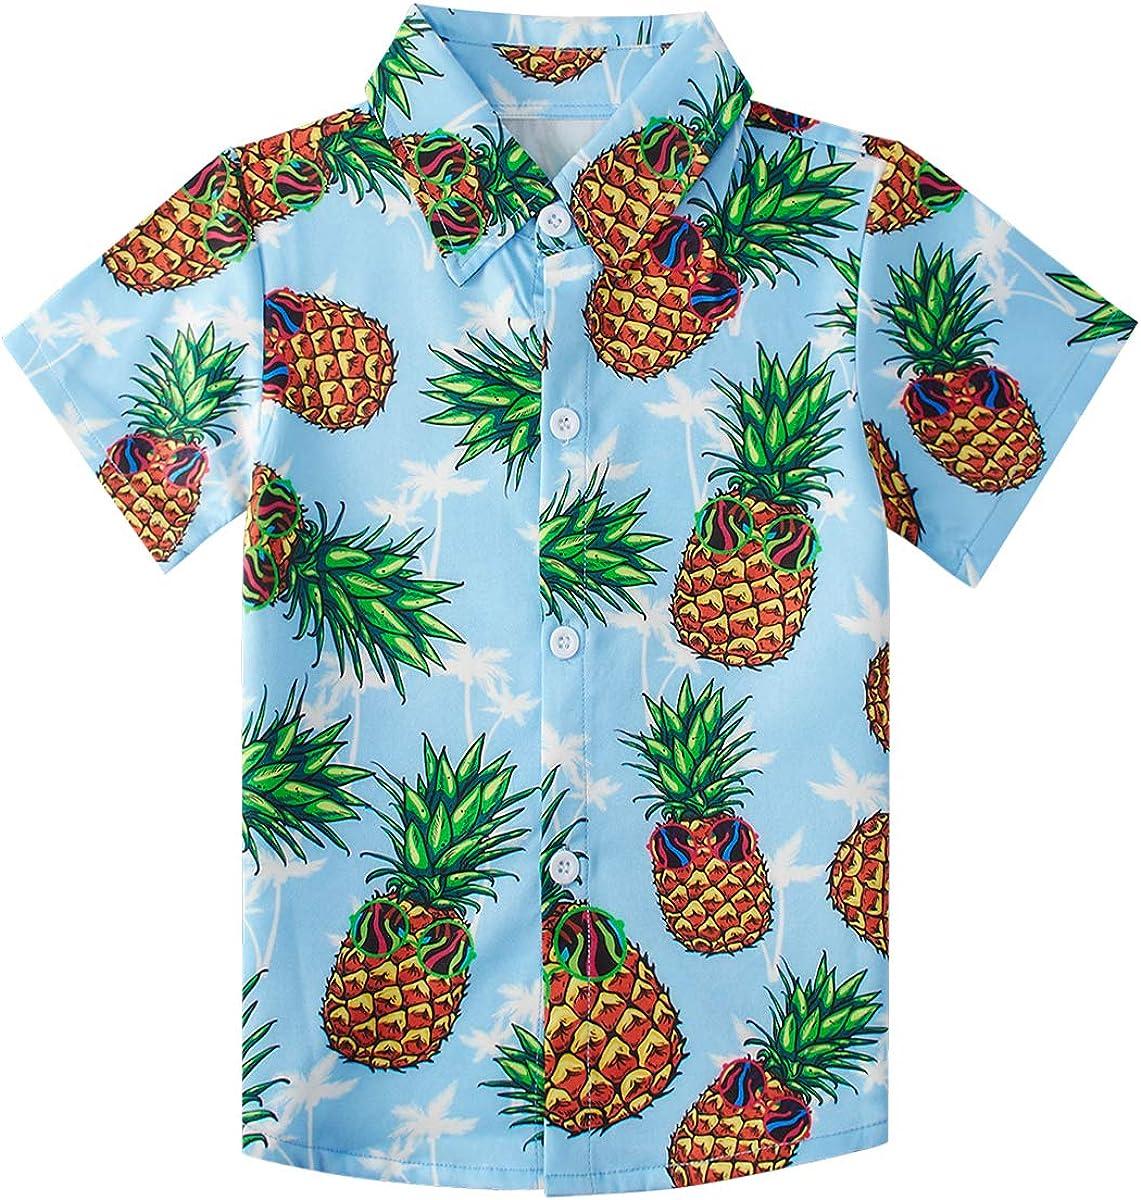 uideazone Boys Hawaiian Shirts Novelty Printed Funky Short Sleeve Button Down Shirt Kids Aloha Luau Shirt 7-14T